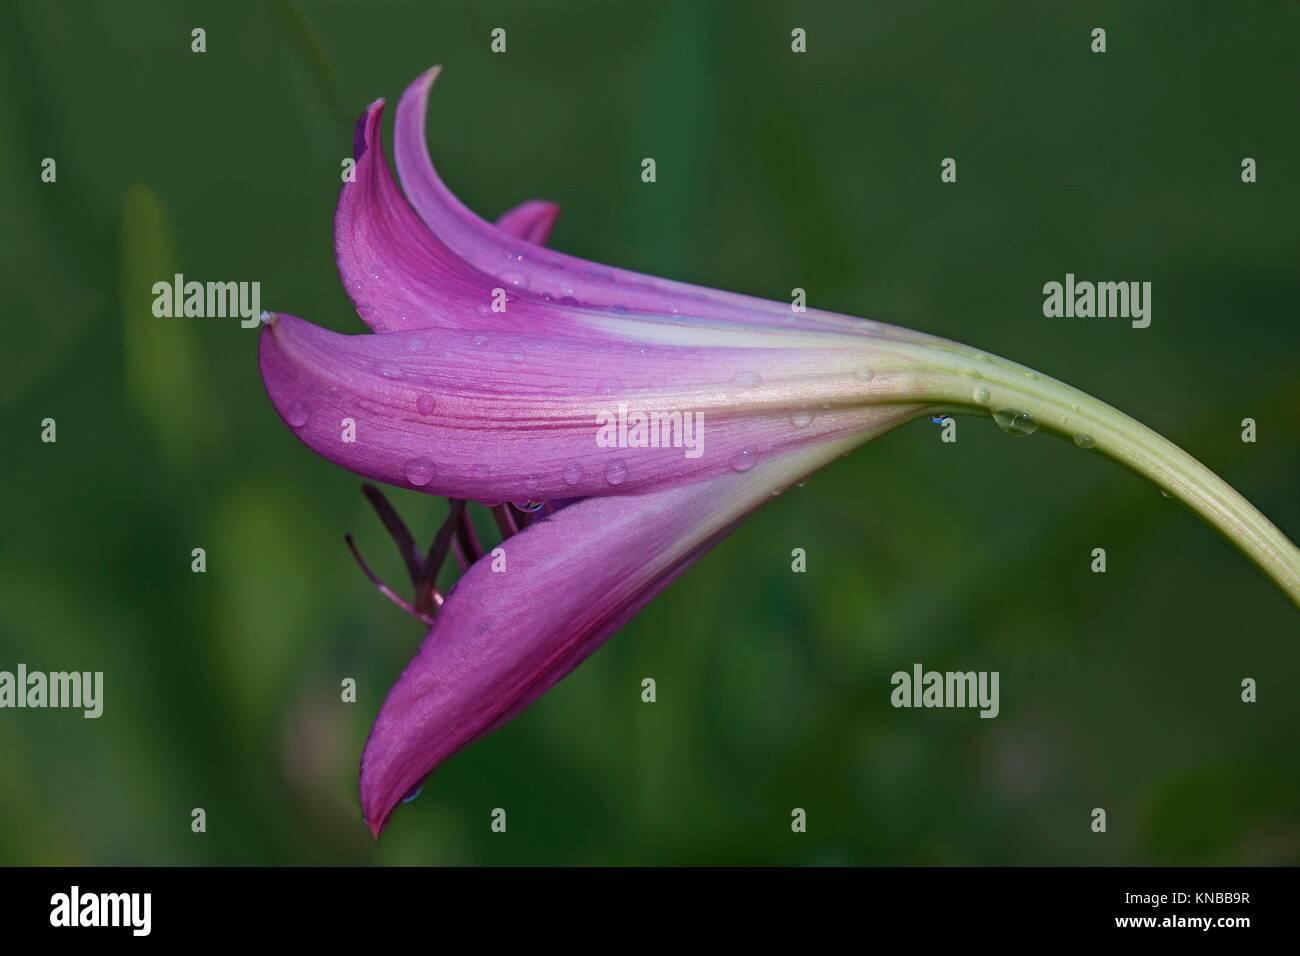 Swamp lily (Crinum x powellii). Hybrid between Crinum bulbispermum and Crunum moorei. Close up image of flower. Stock Photo